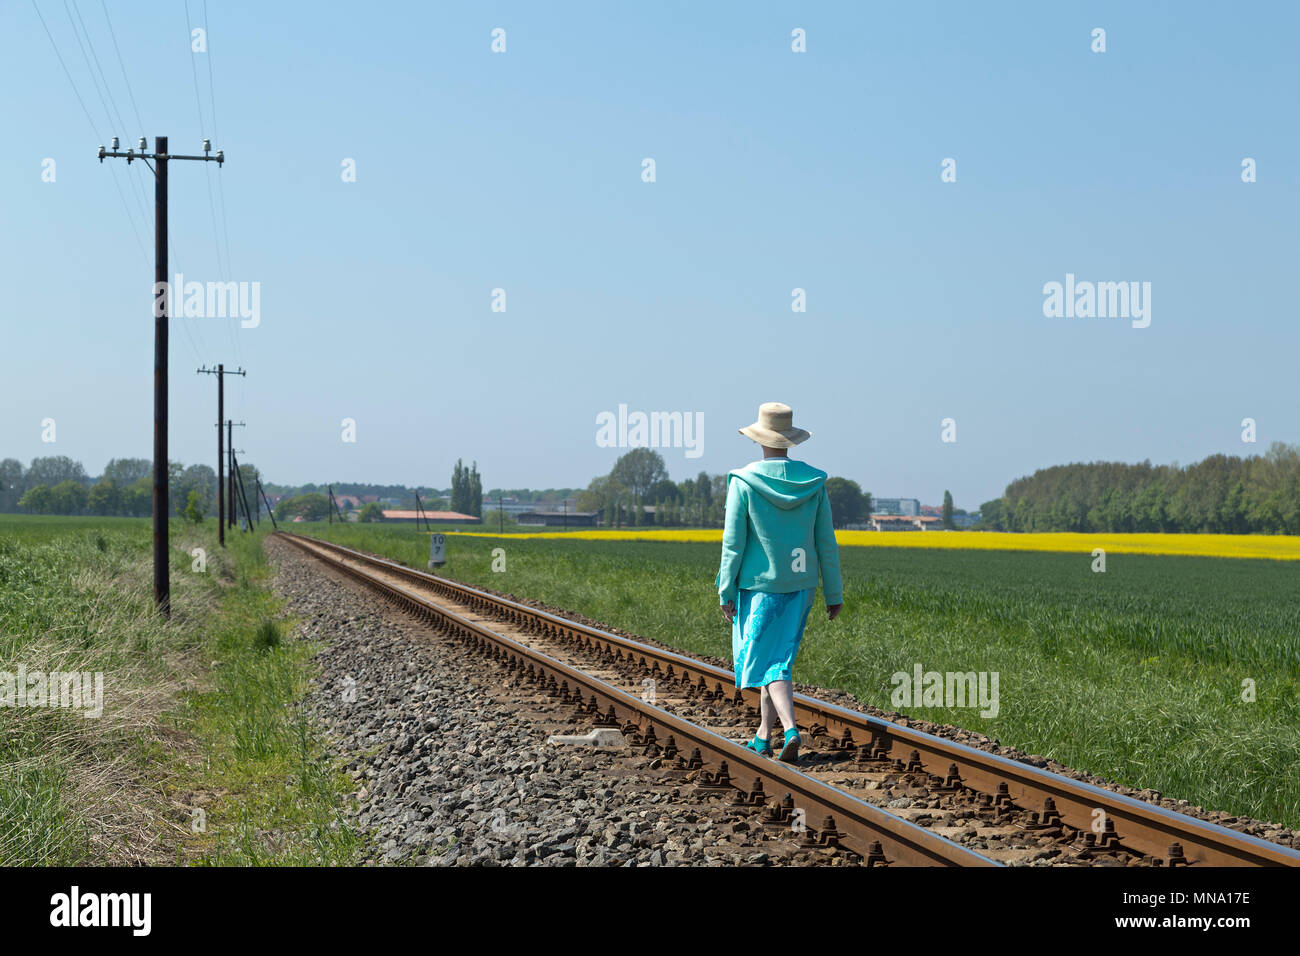 woman walking along railway tracks of the steam train Molli, Klein Bollhagen near Kuehlungsborn, Mecklenburg-West Pomerania, Germany - Stock Image